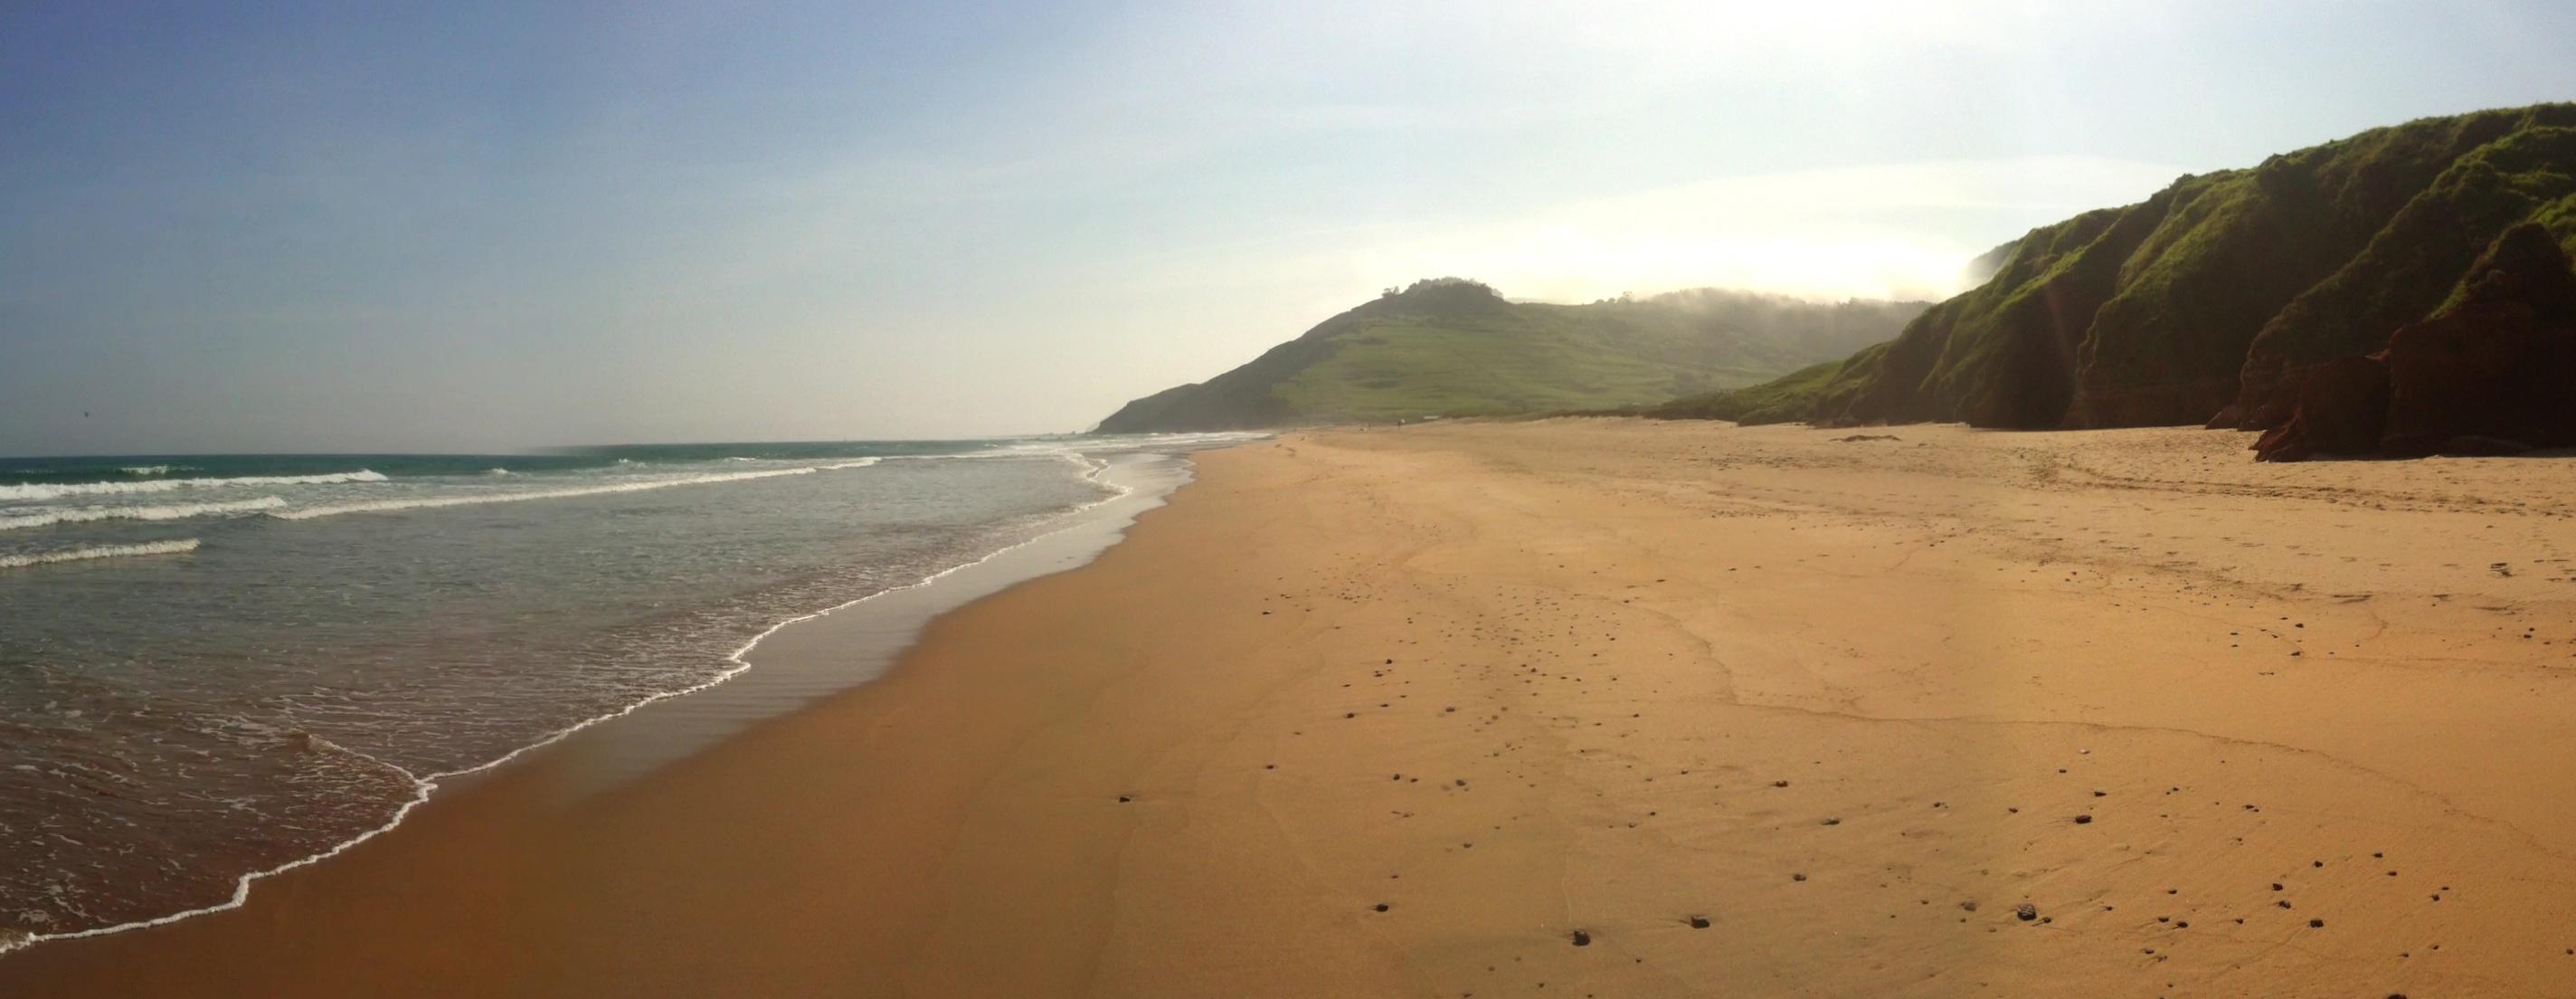 playa-de-vega-asturias-03